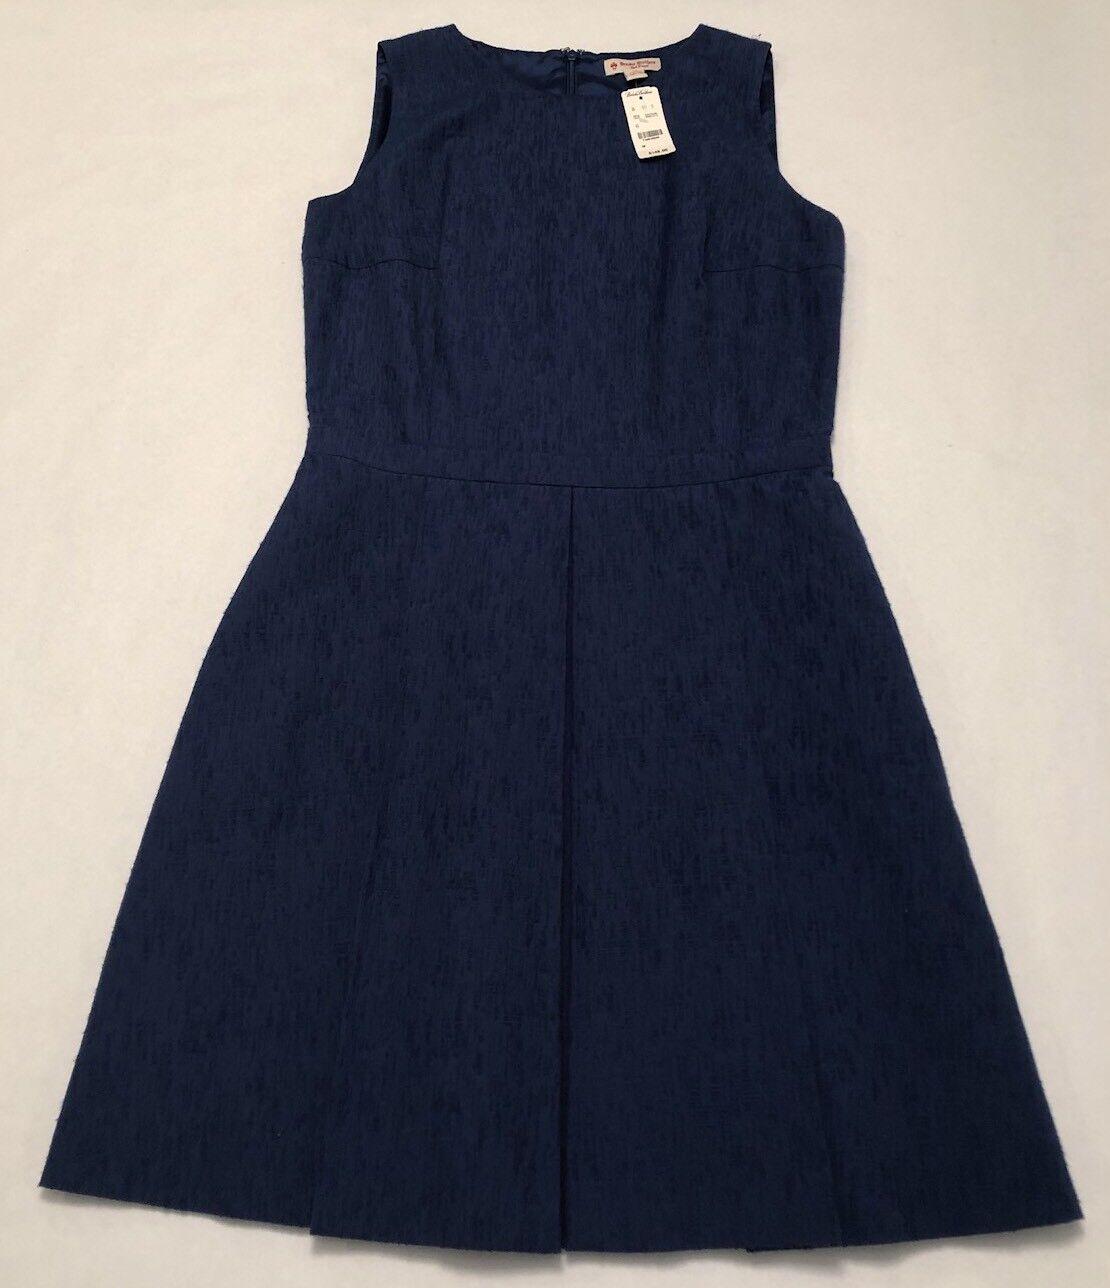 Brooks Bredhers Red Fleece Womens Dress Size 10 Dark bluee Brand New NWT